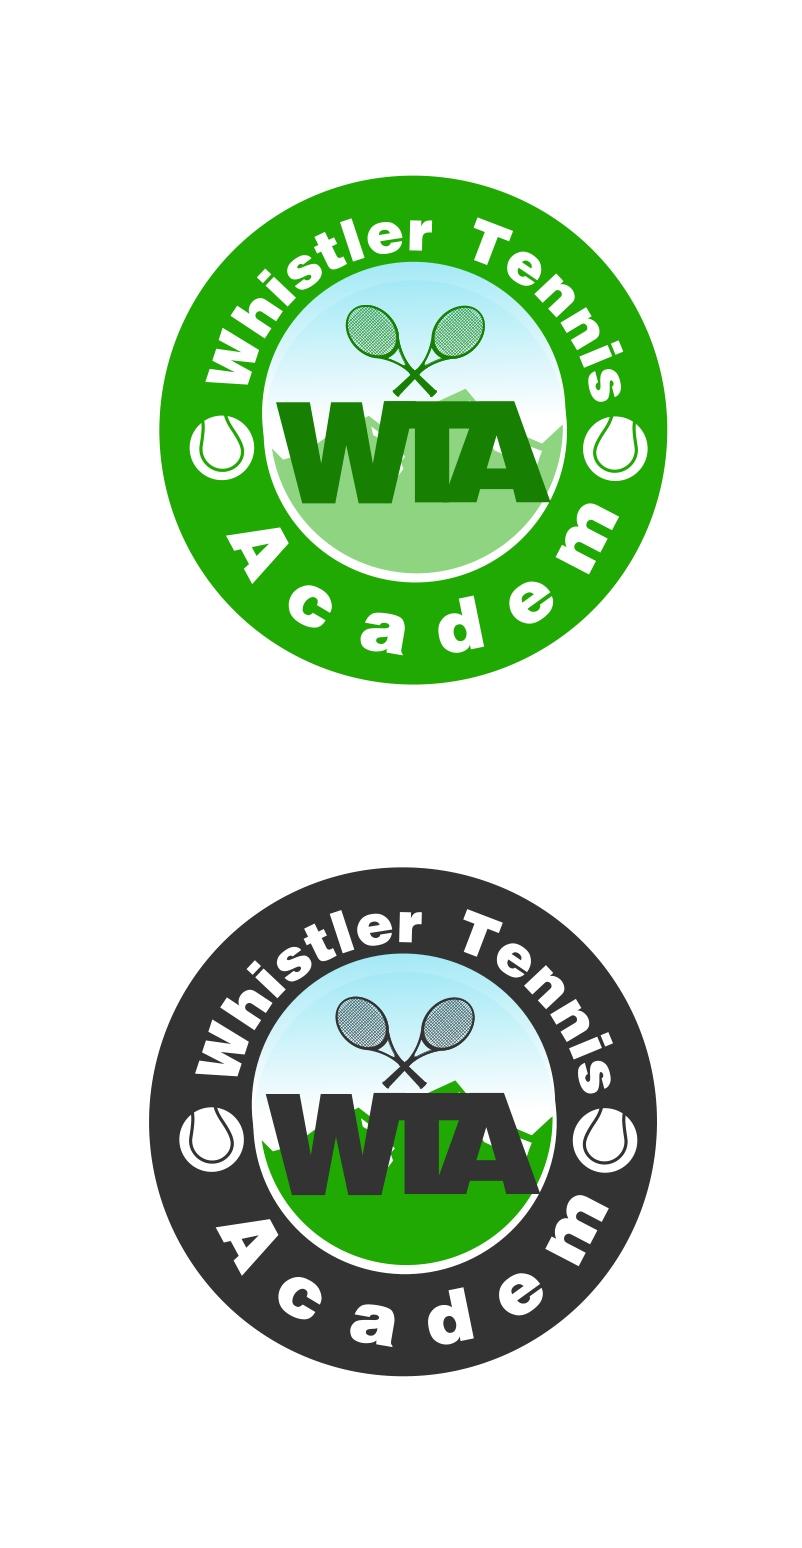 Logo Design by Private User - Entry No. 39 in the Logo Design Contest Imaginative Logo Design for Whistler Tennis Academy.